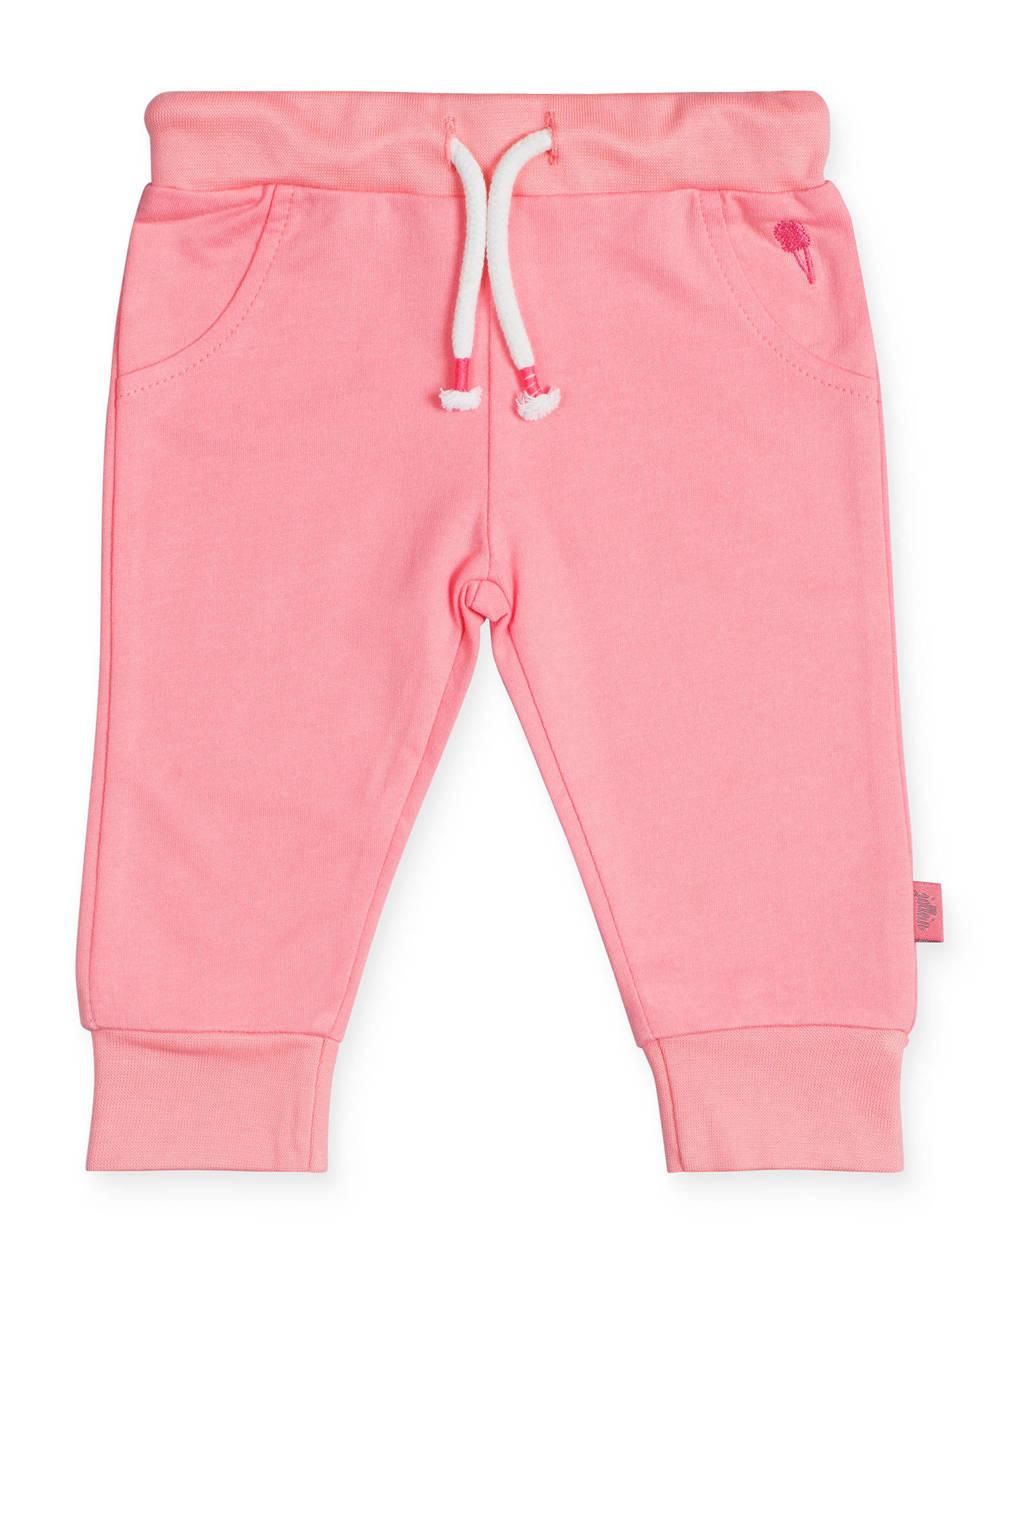 Jollein baby newborn joggingbroek roze, Roze